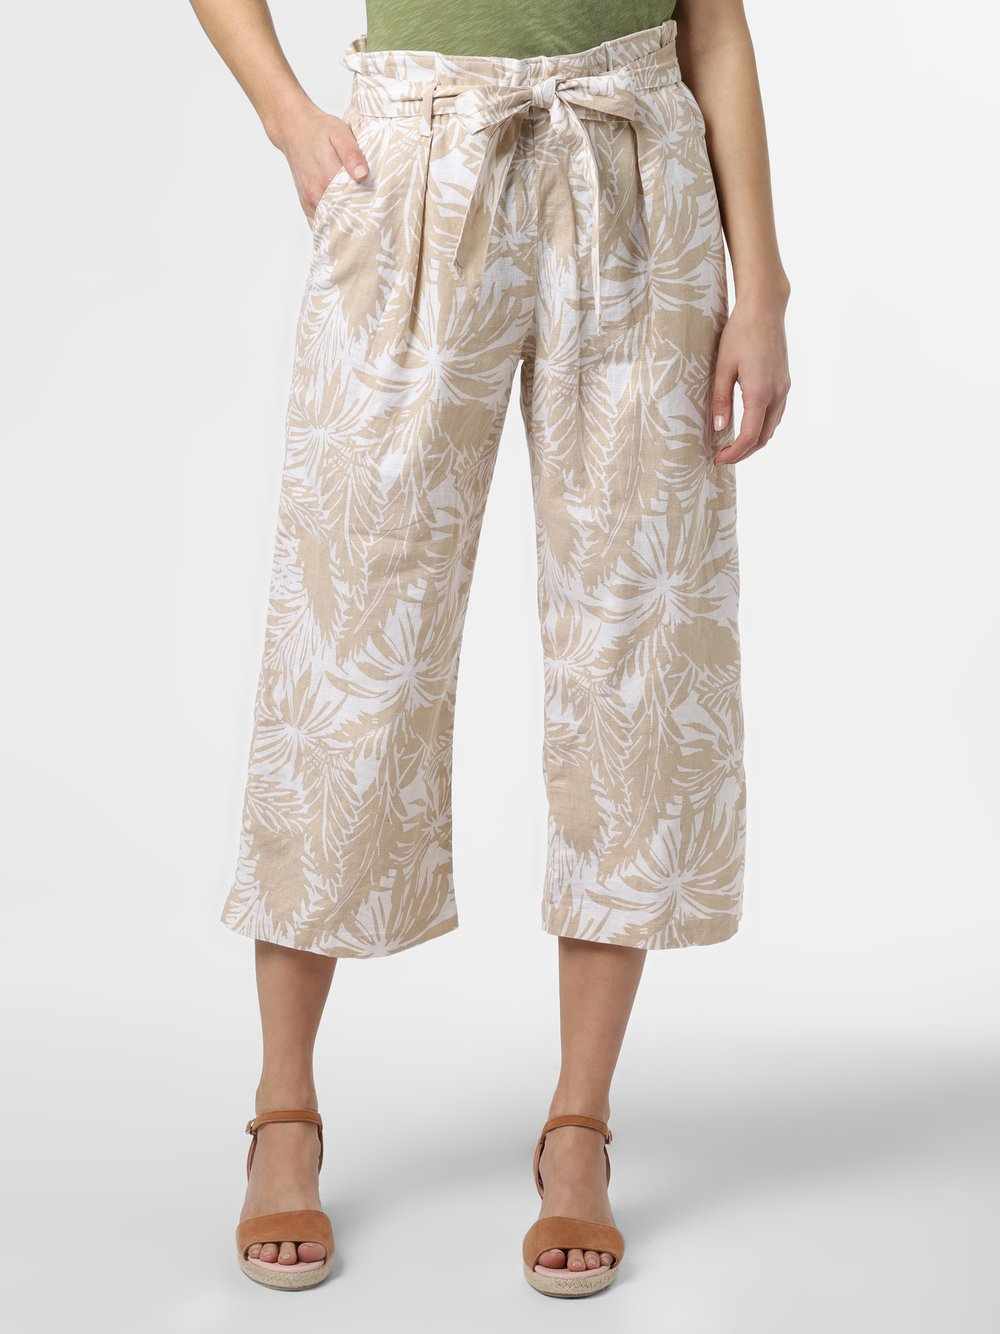 Franco Callegari - Damskie spodnie lniane, beżowy